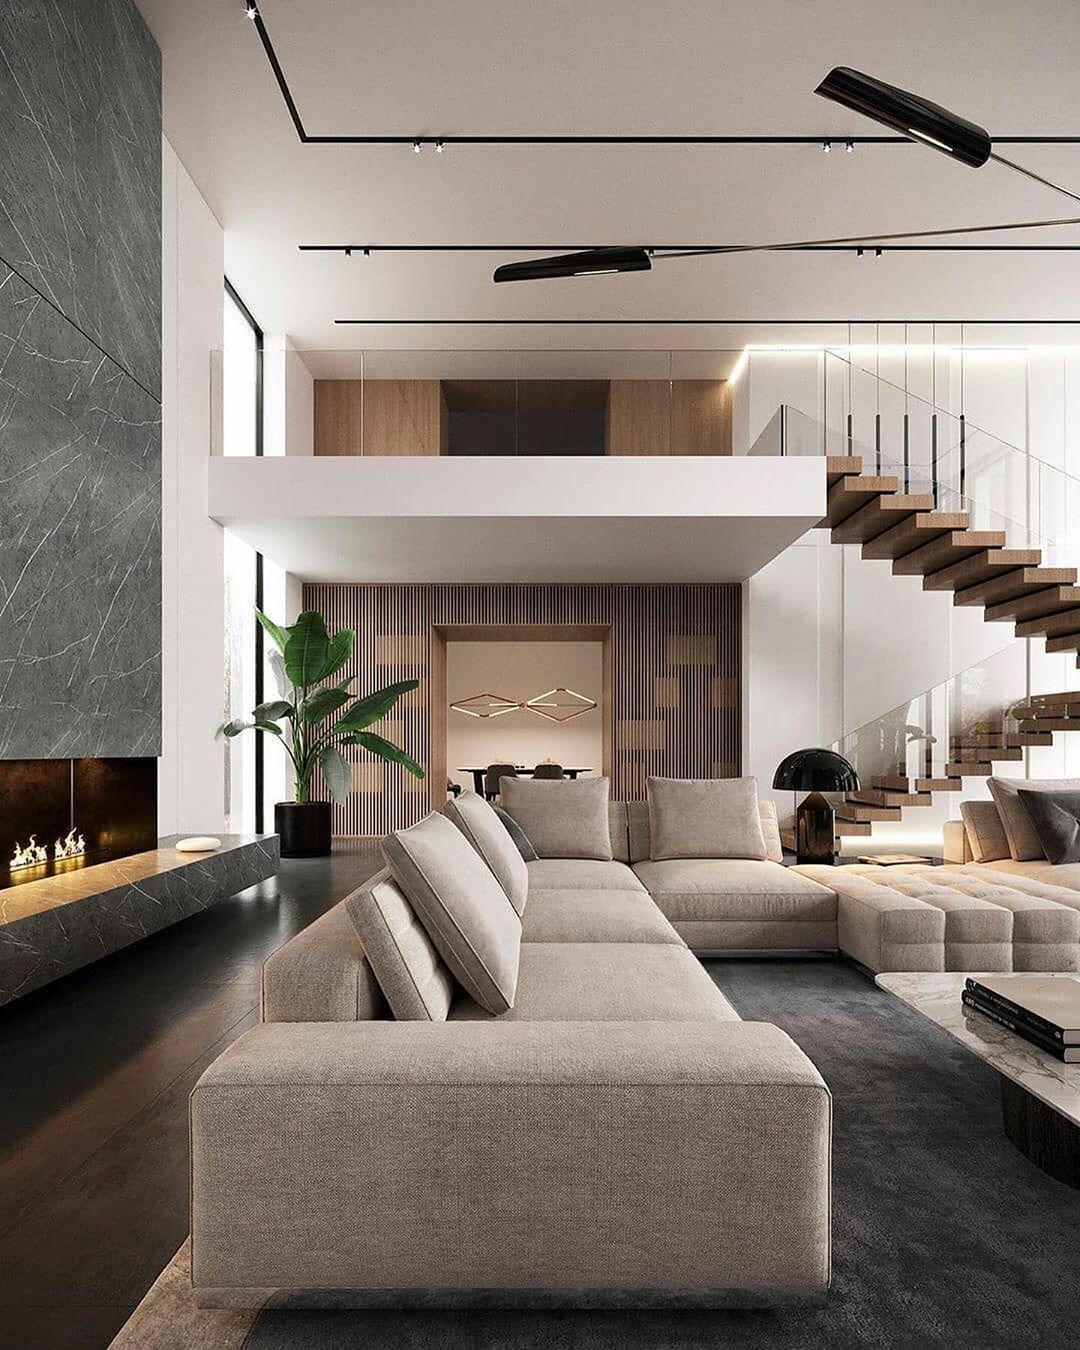 Modern Interior Design On Instagram What A Spectacular Interior Fol In 2020 Interior Design Apartment Small Modern Living Room Interior Apartment Interior Design